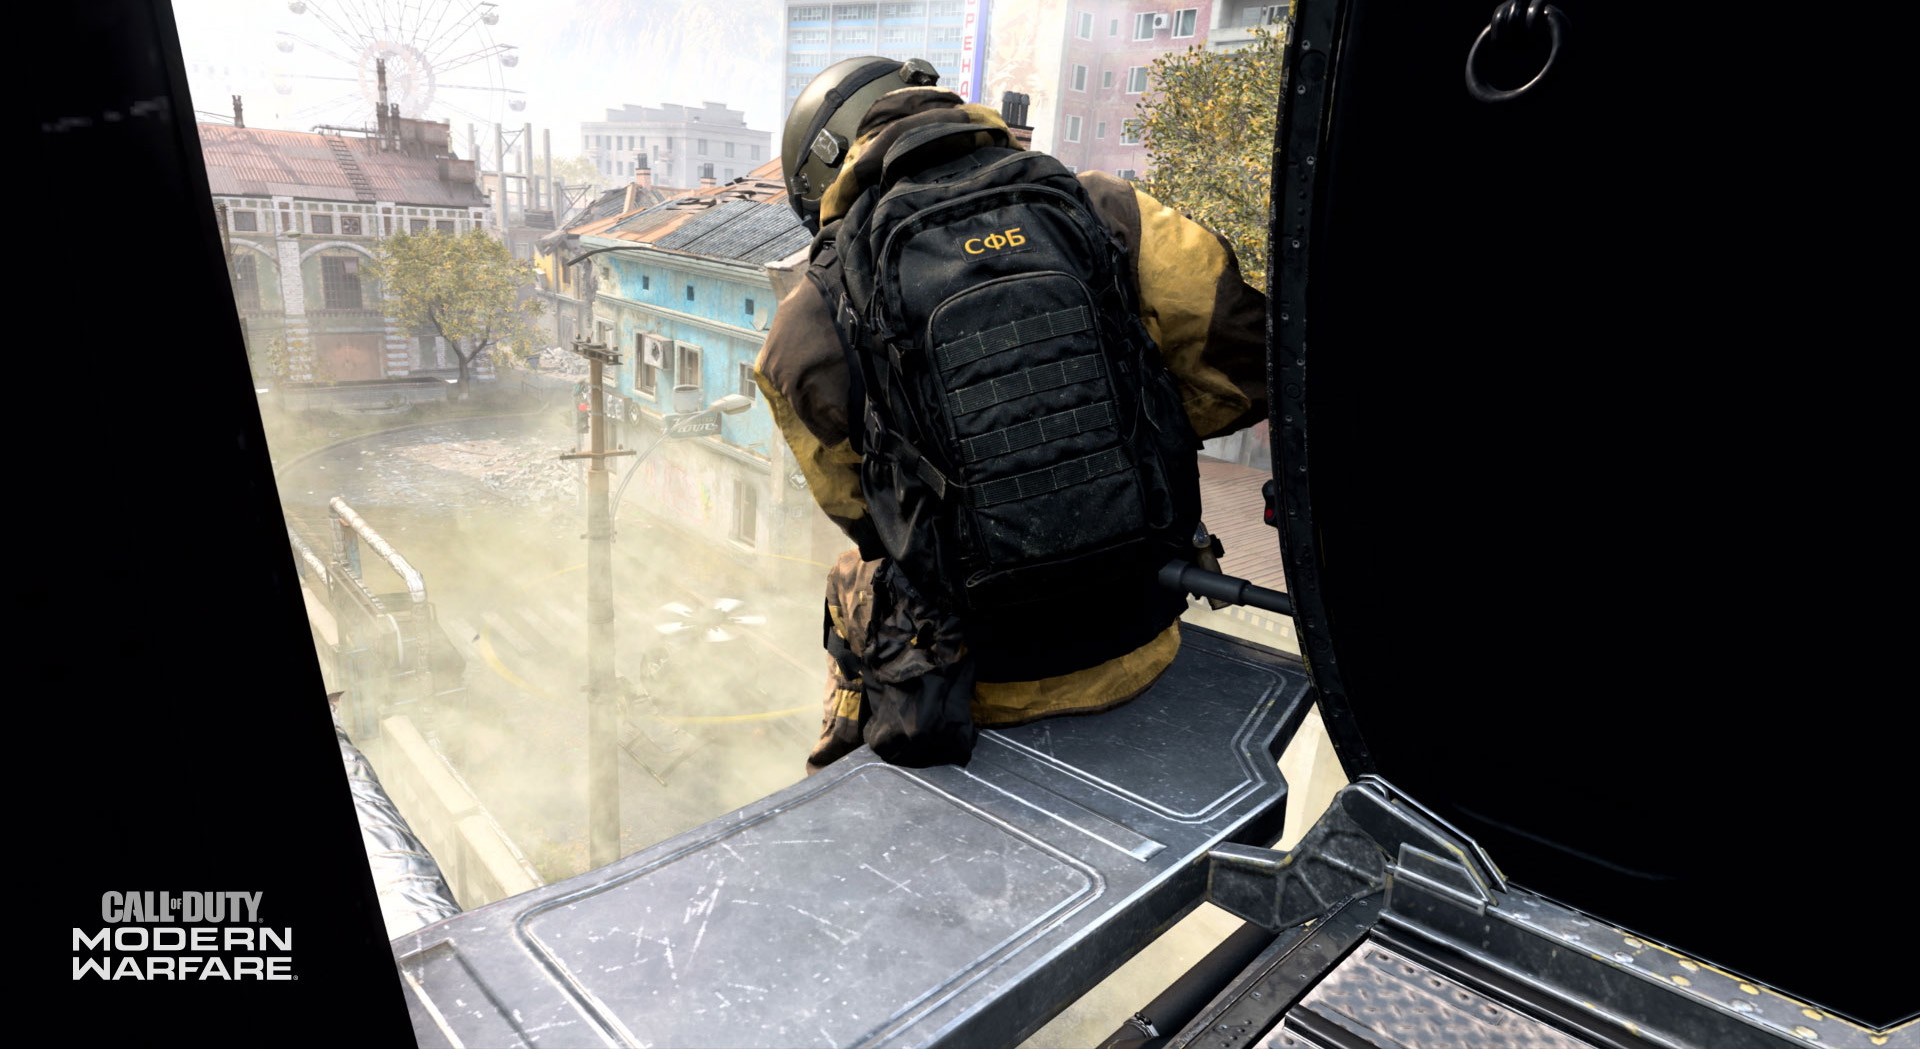 General 1920x1049 Call of Duty Modern Warfare army video games